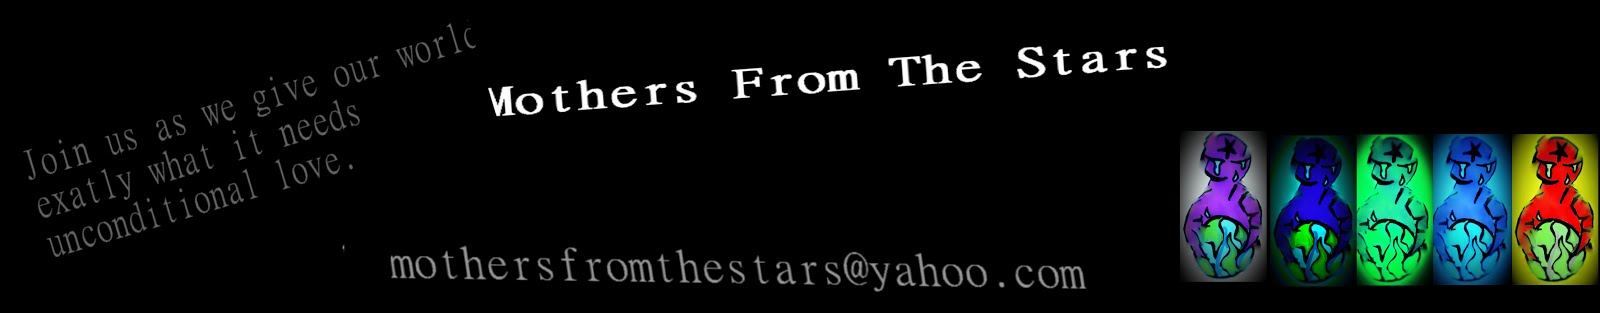 MothersFromTheStars